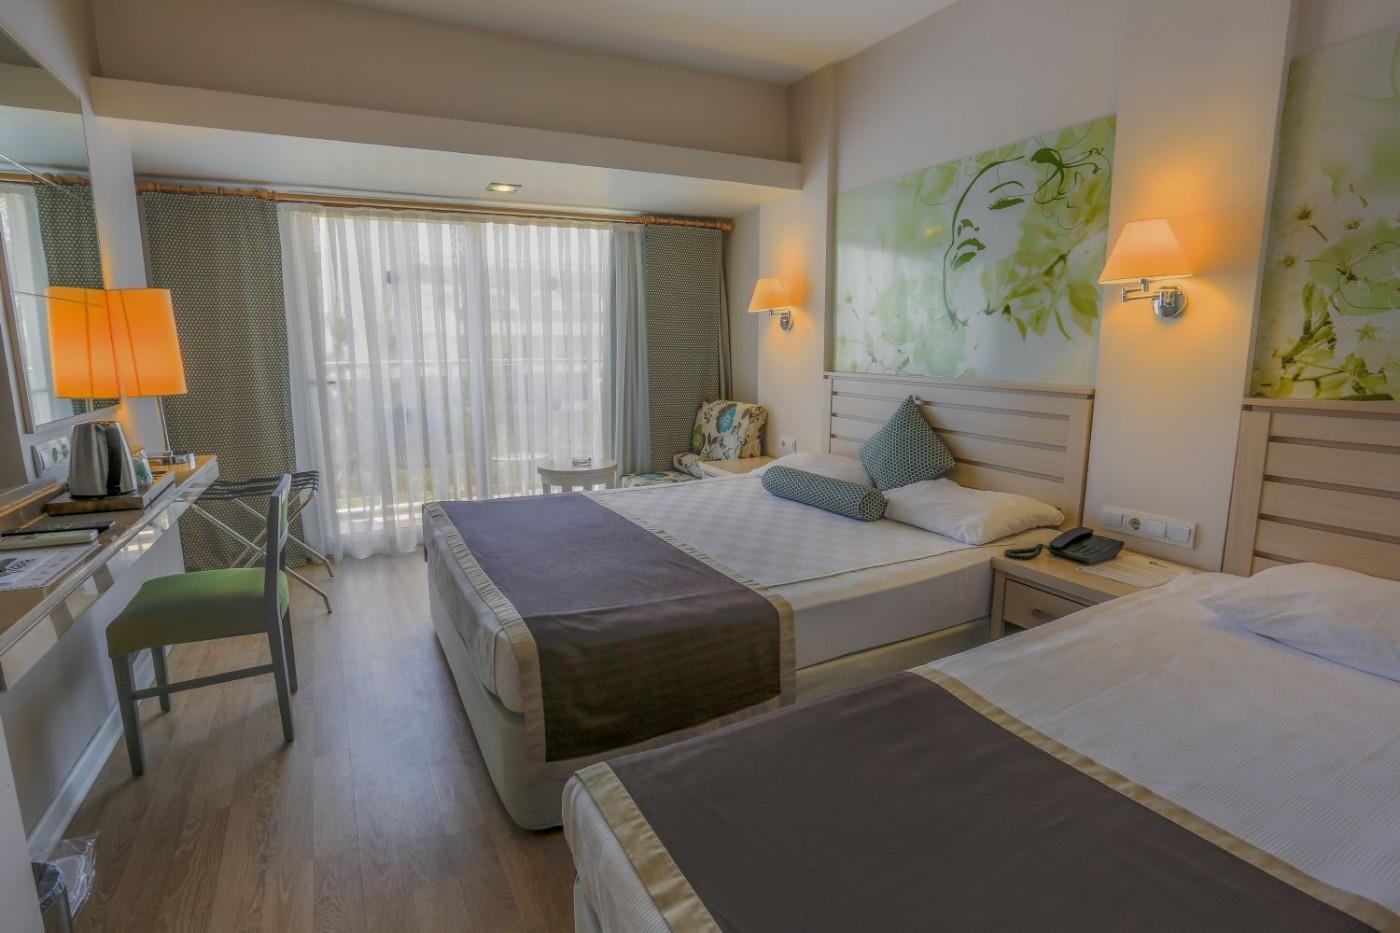 http://www.orextravel.sk/OREX/hotelphotos/thalia-unique-area-0023.jpg